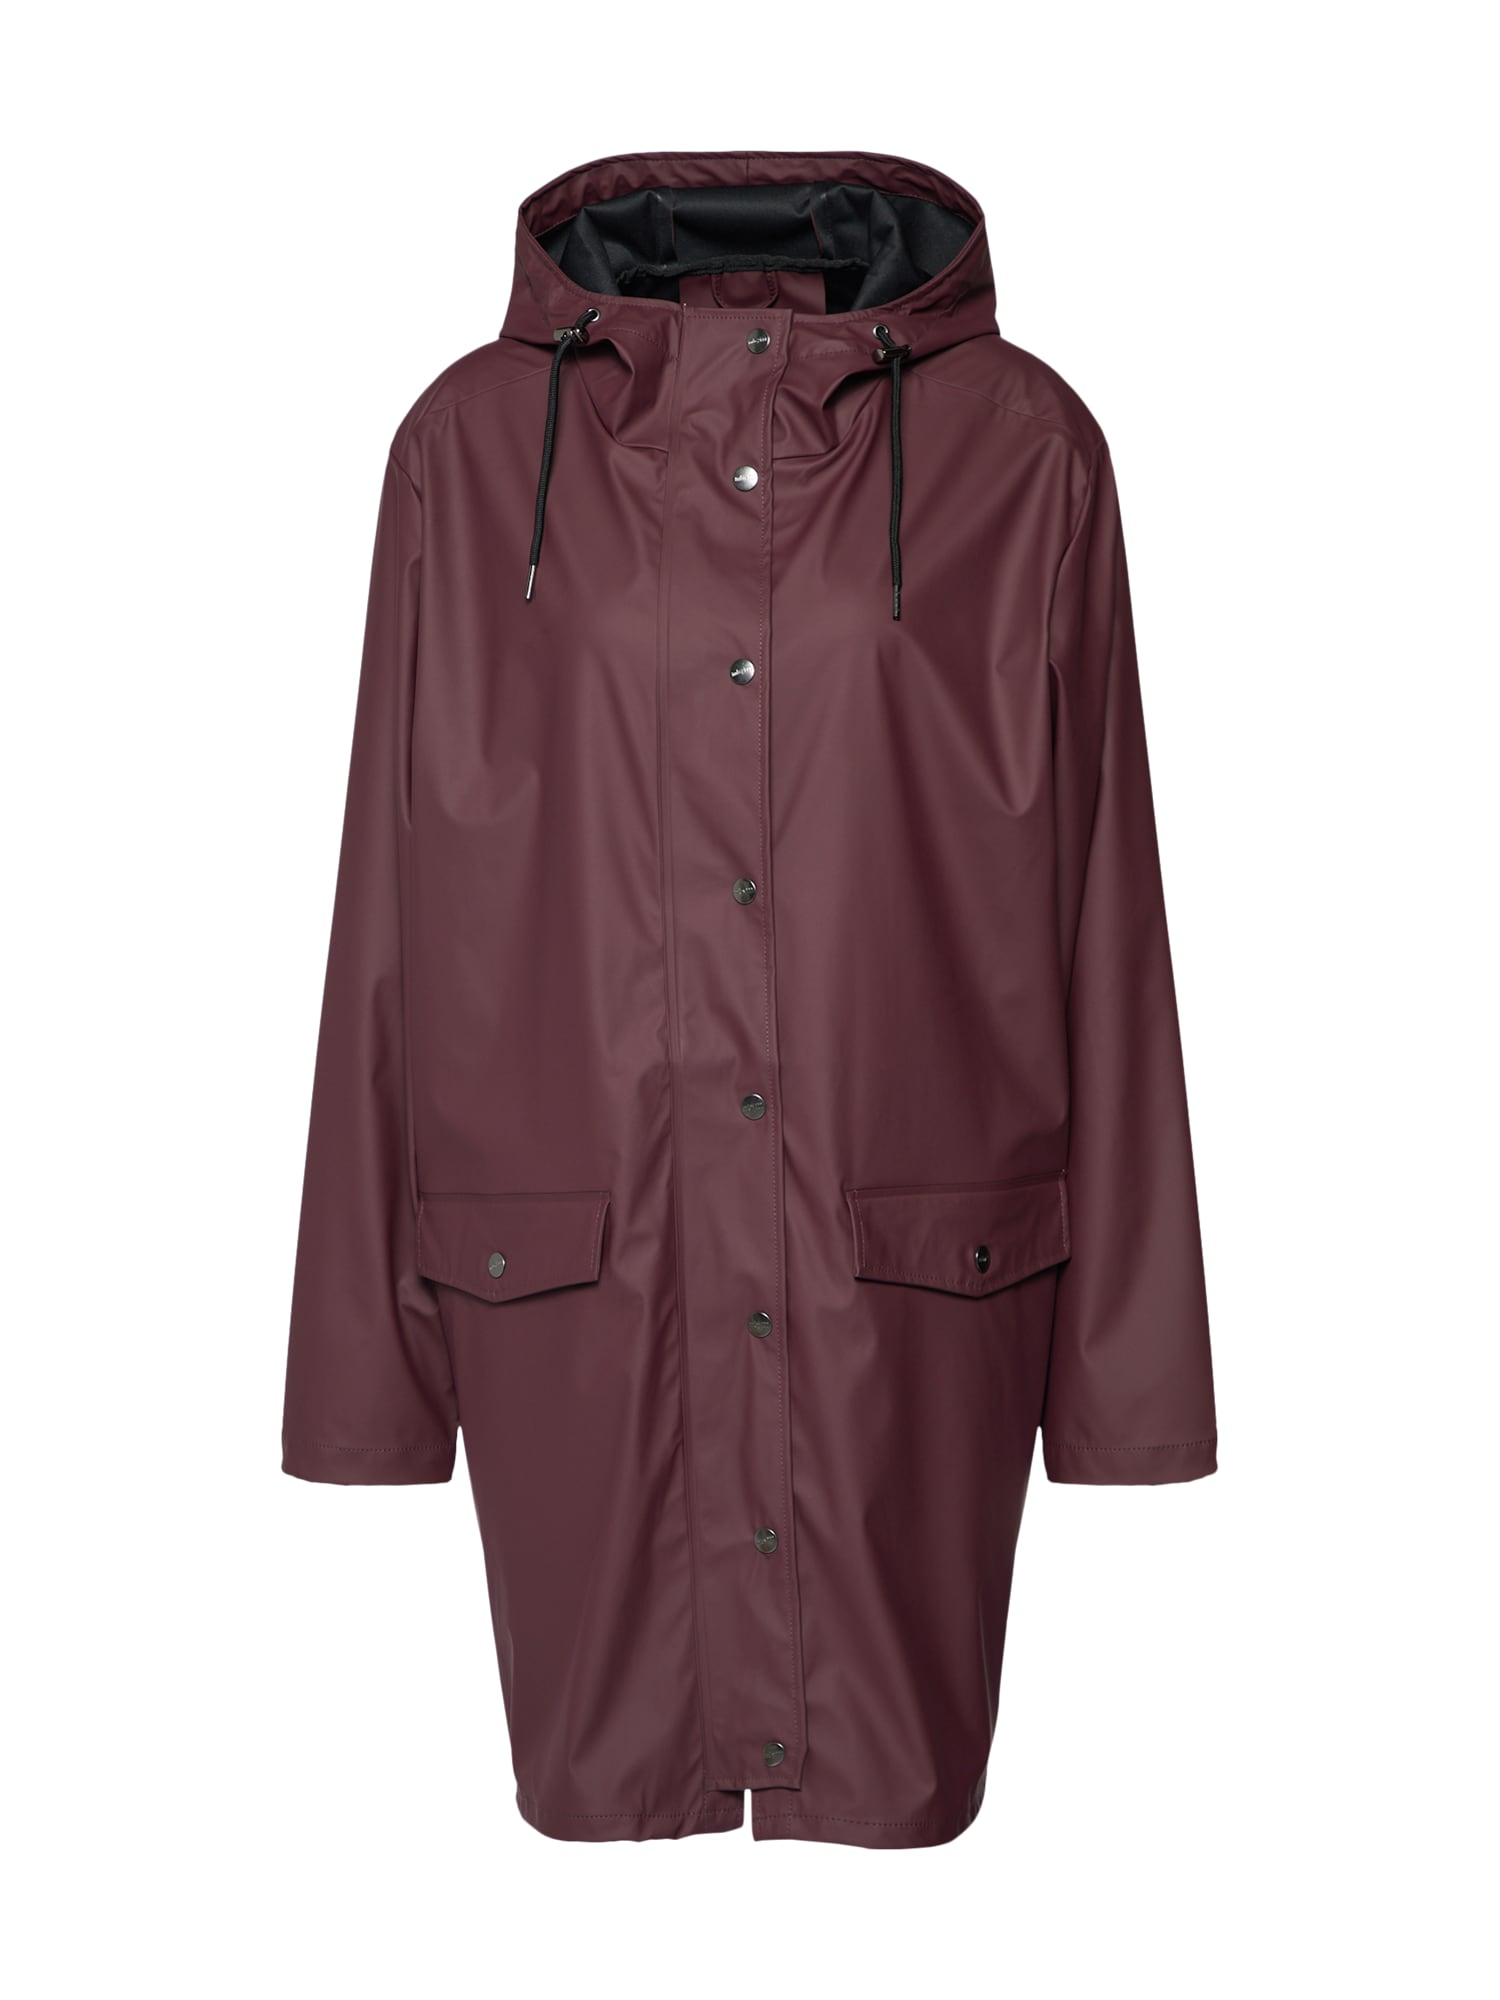 Přechodný kabát Fabiola bordeaux Mbym